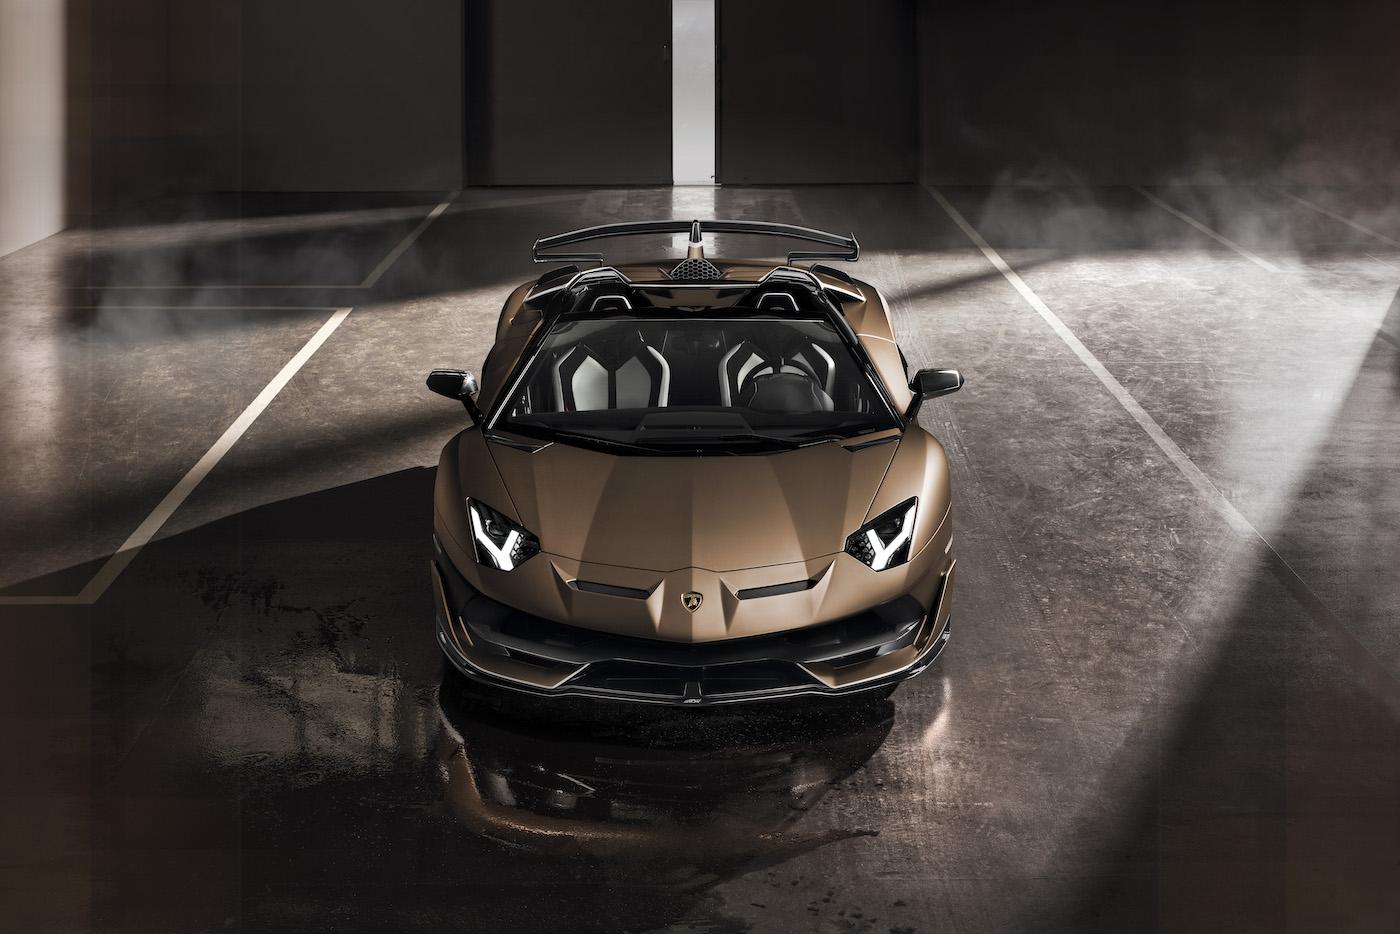 Oben ohne mit 350 km/h: Lamborghini präsentiert den Aventador SVJ Roadster in Genf 12